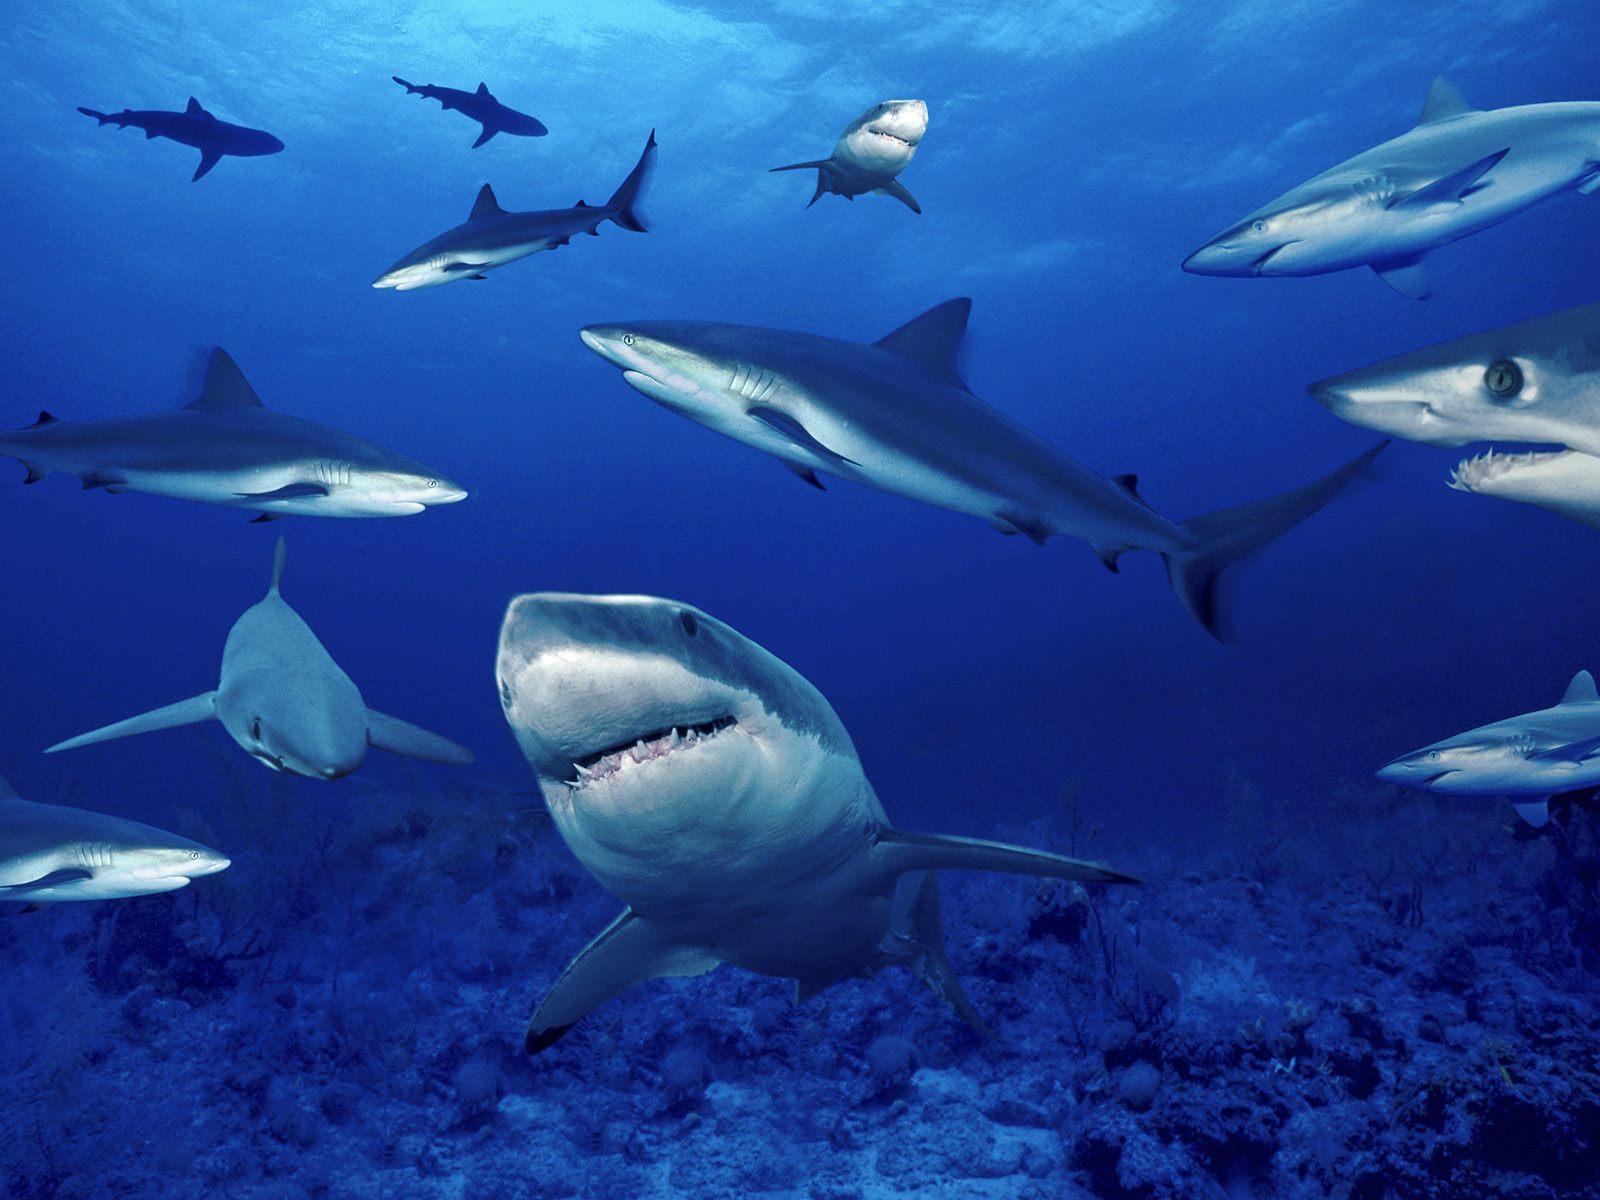 Terrors of the Deep   Ocean Life Photography Desktop Wallpapers 1600x1200